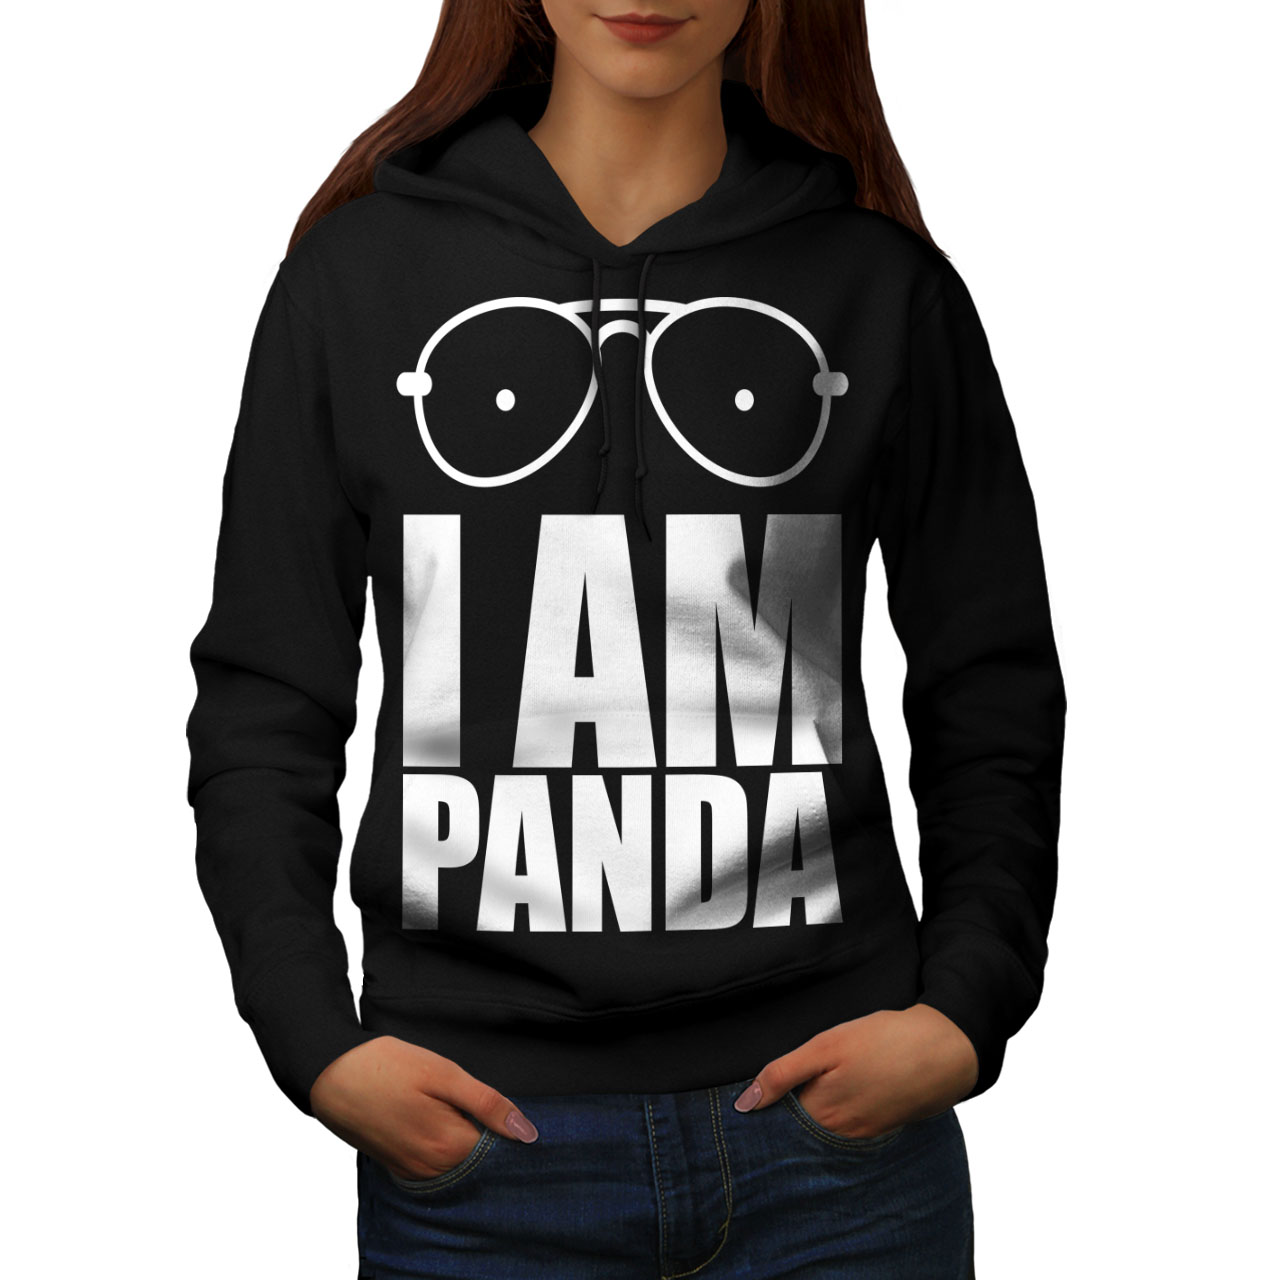 Wild Casual Pullover Jumper Wellcoda Panda Saying Funny Womens Sweatshirt